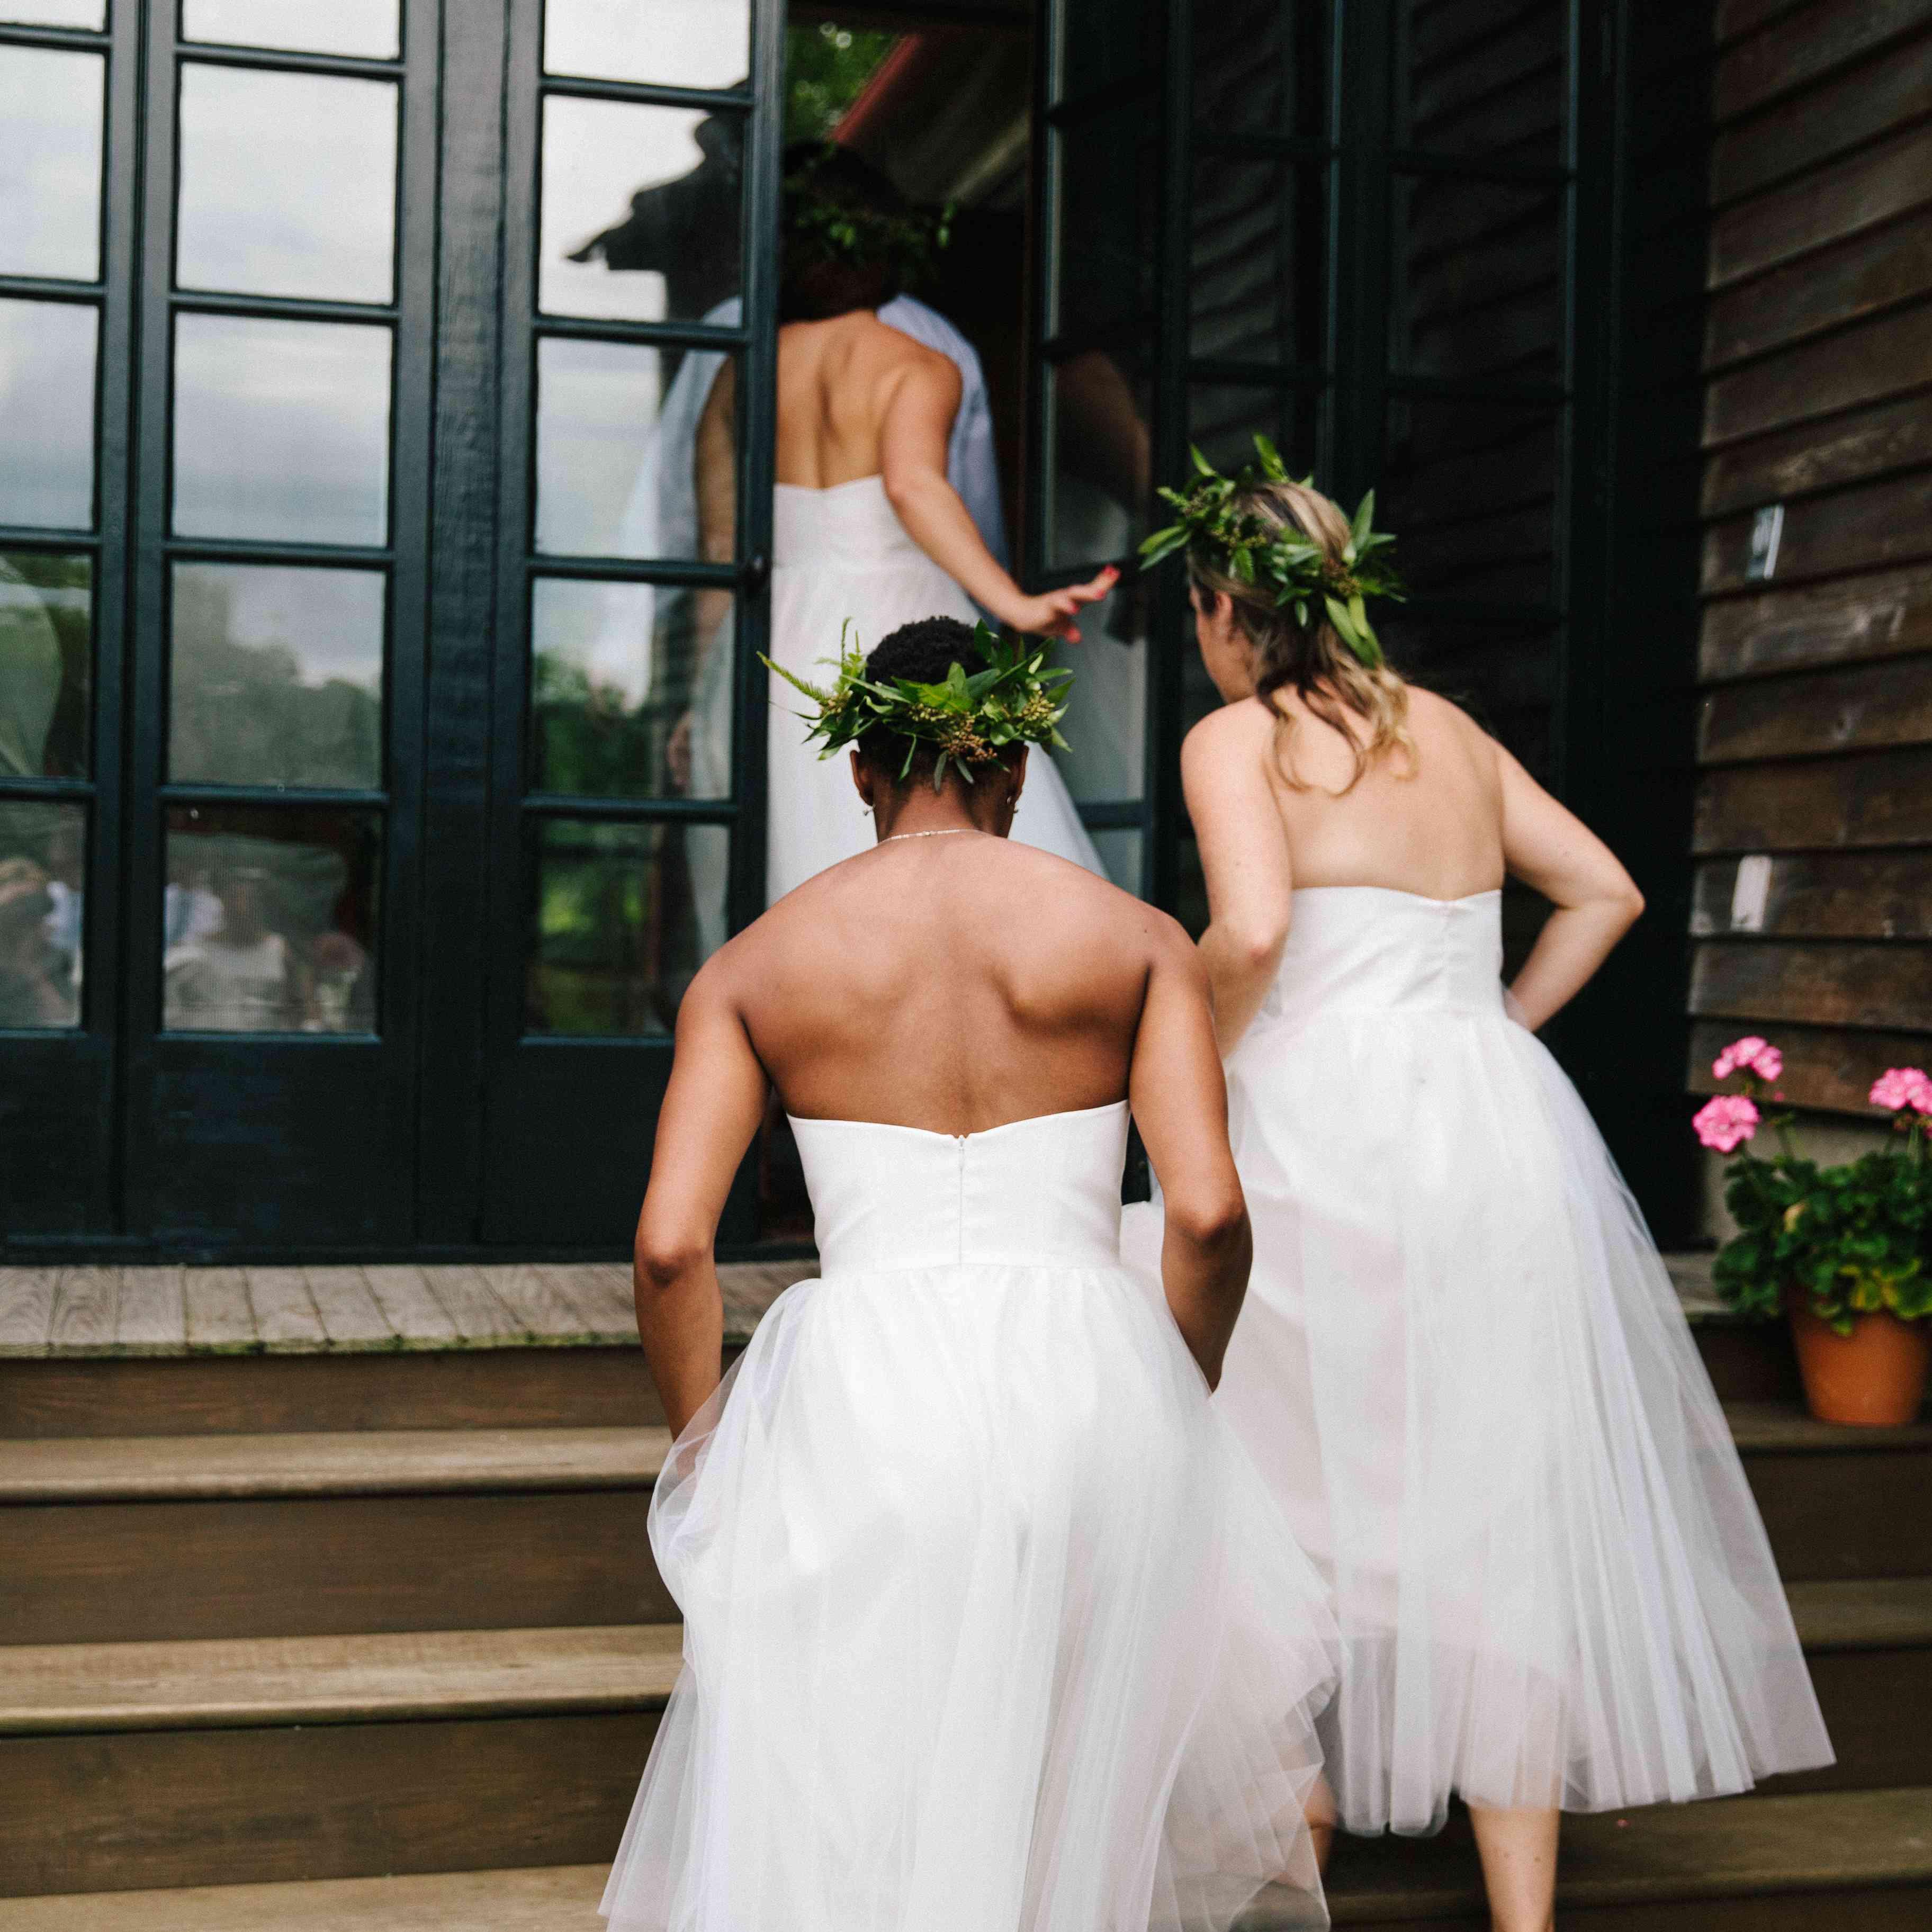 bridesmaids in white walking up stairs